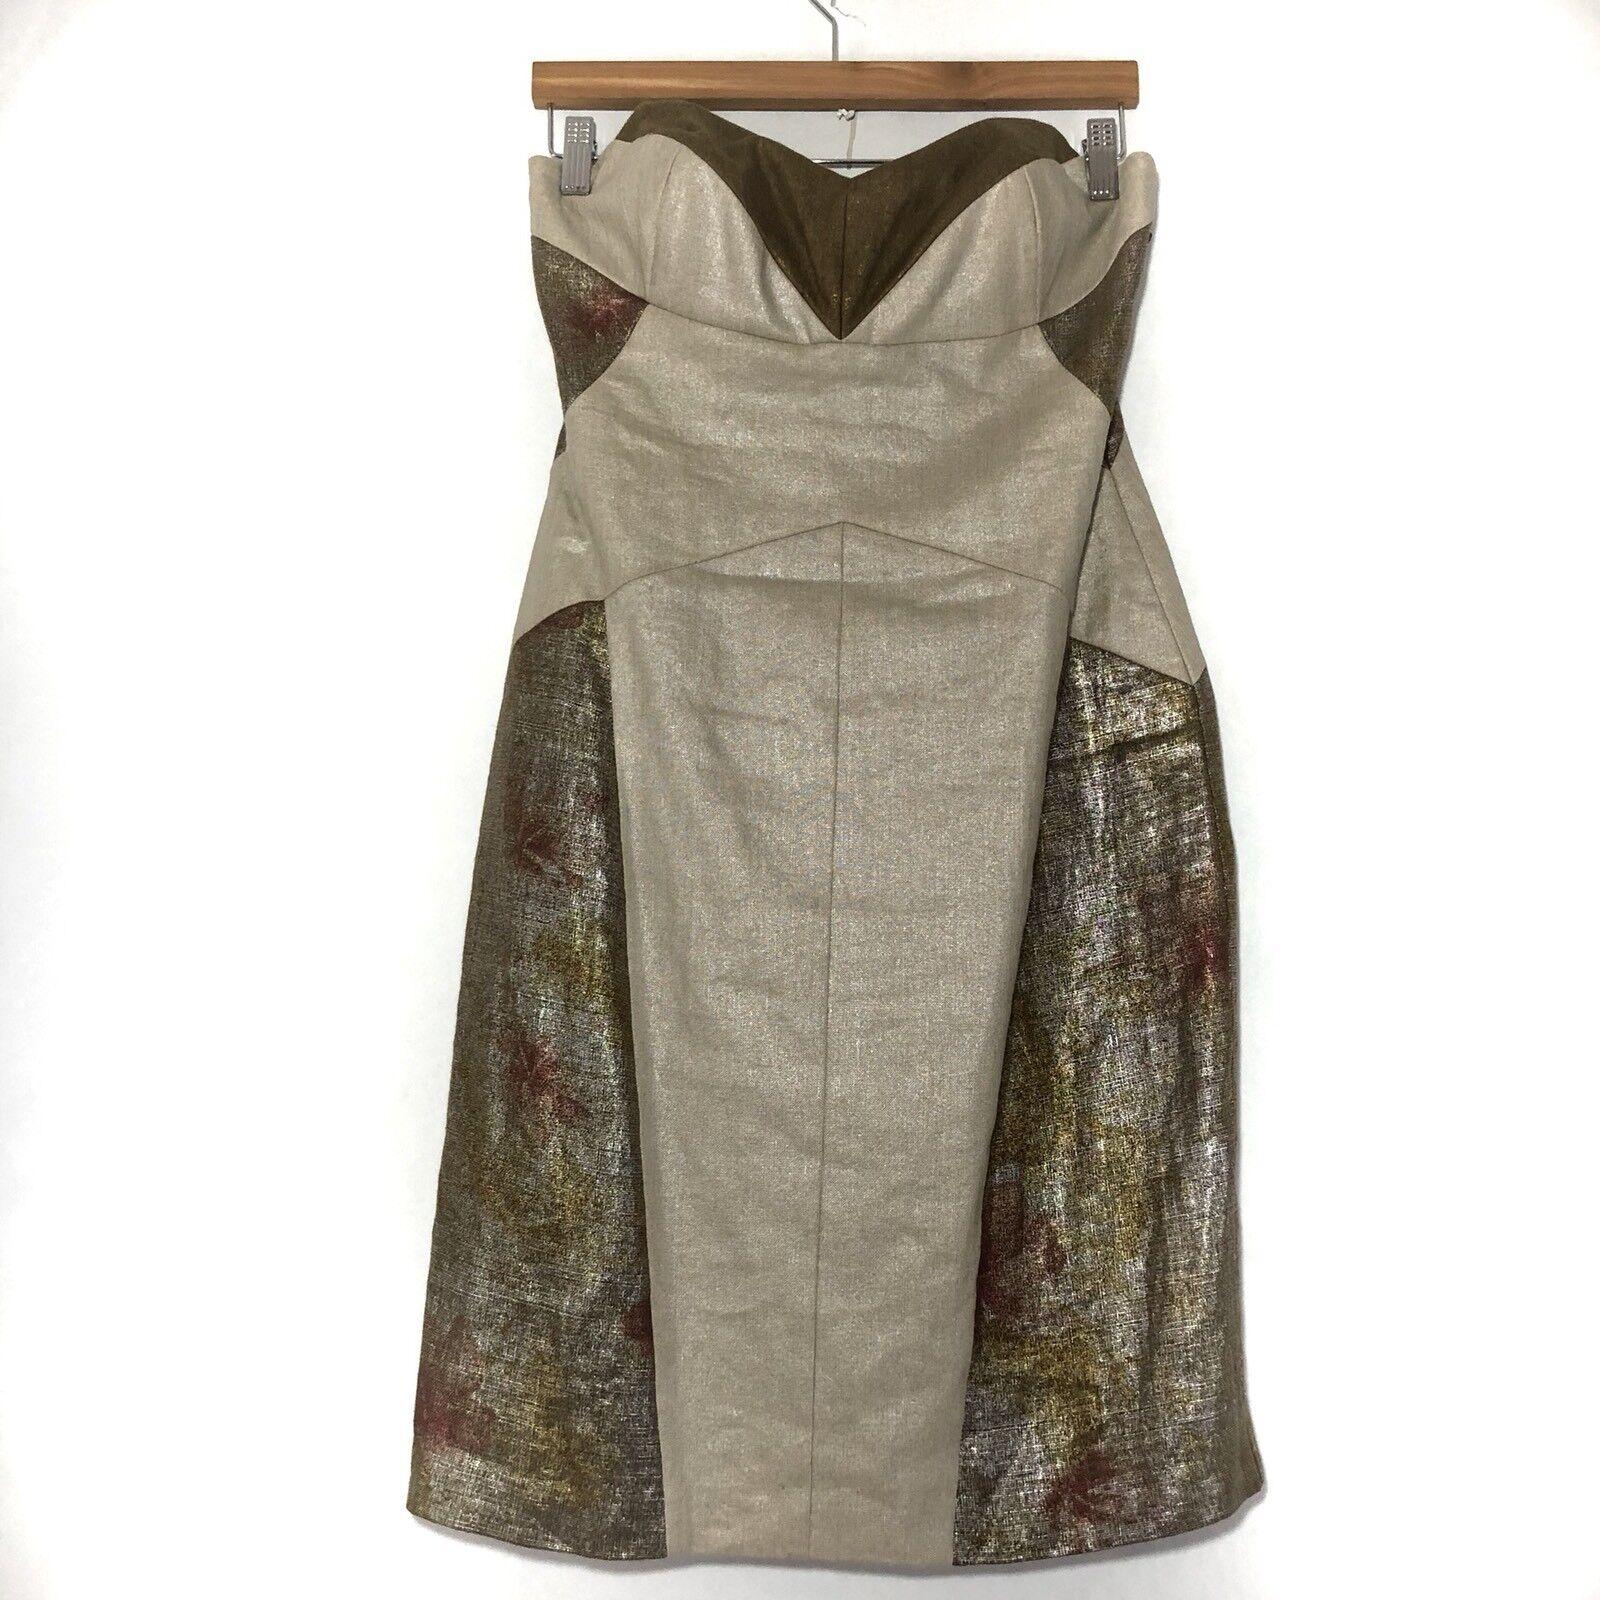 Nicole Miller Collection Dress Size 10 Brown Beige Linen Metallic Strapless